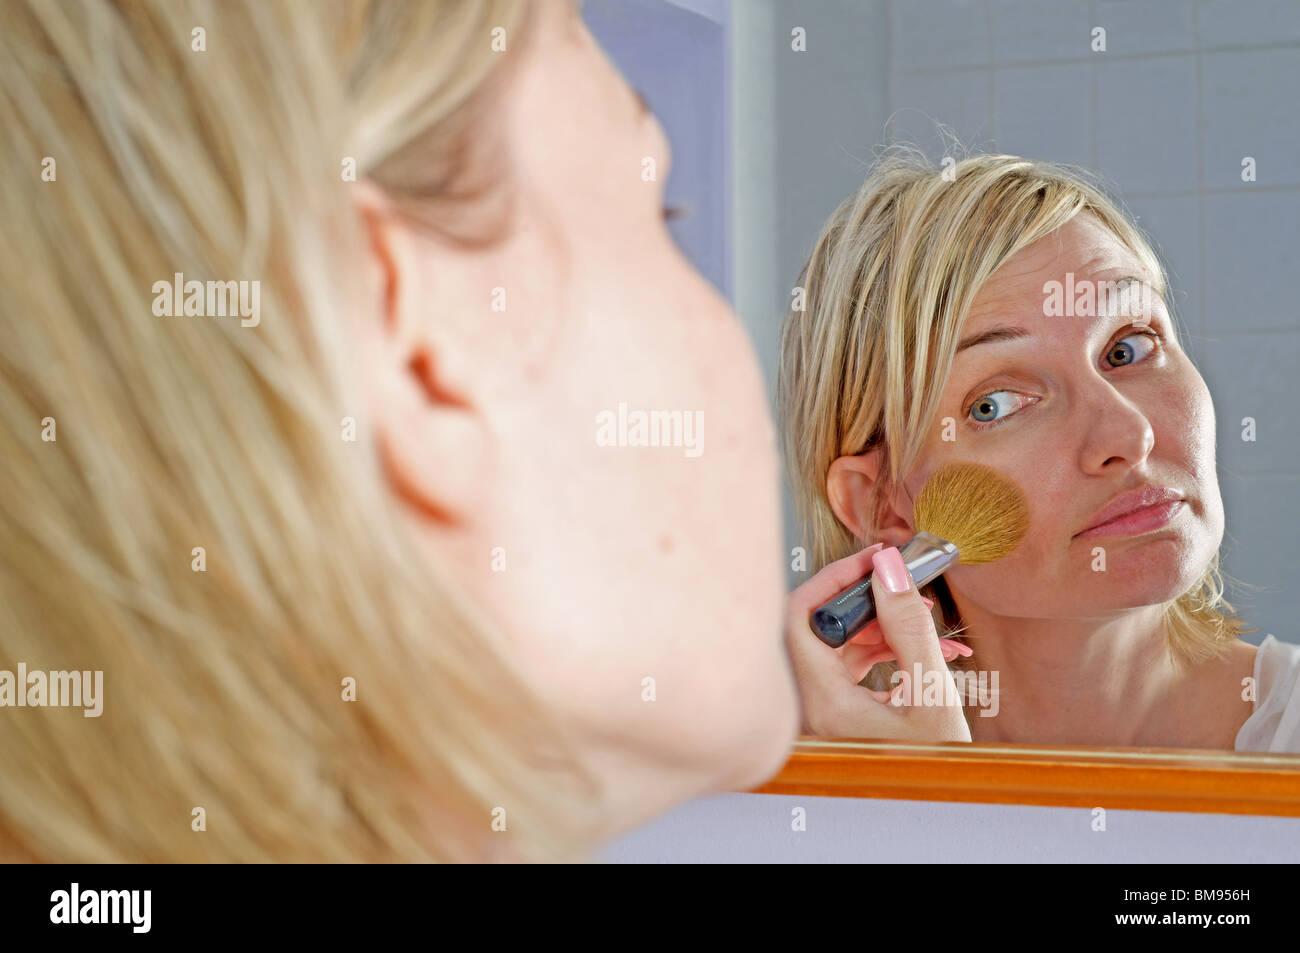 Fundación Mujer aplicar maquillaje con brocha para polvo Imagen De Stock